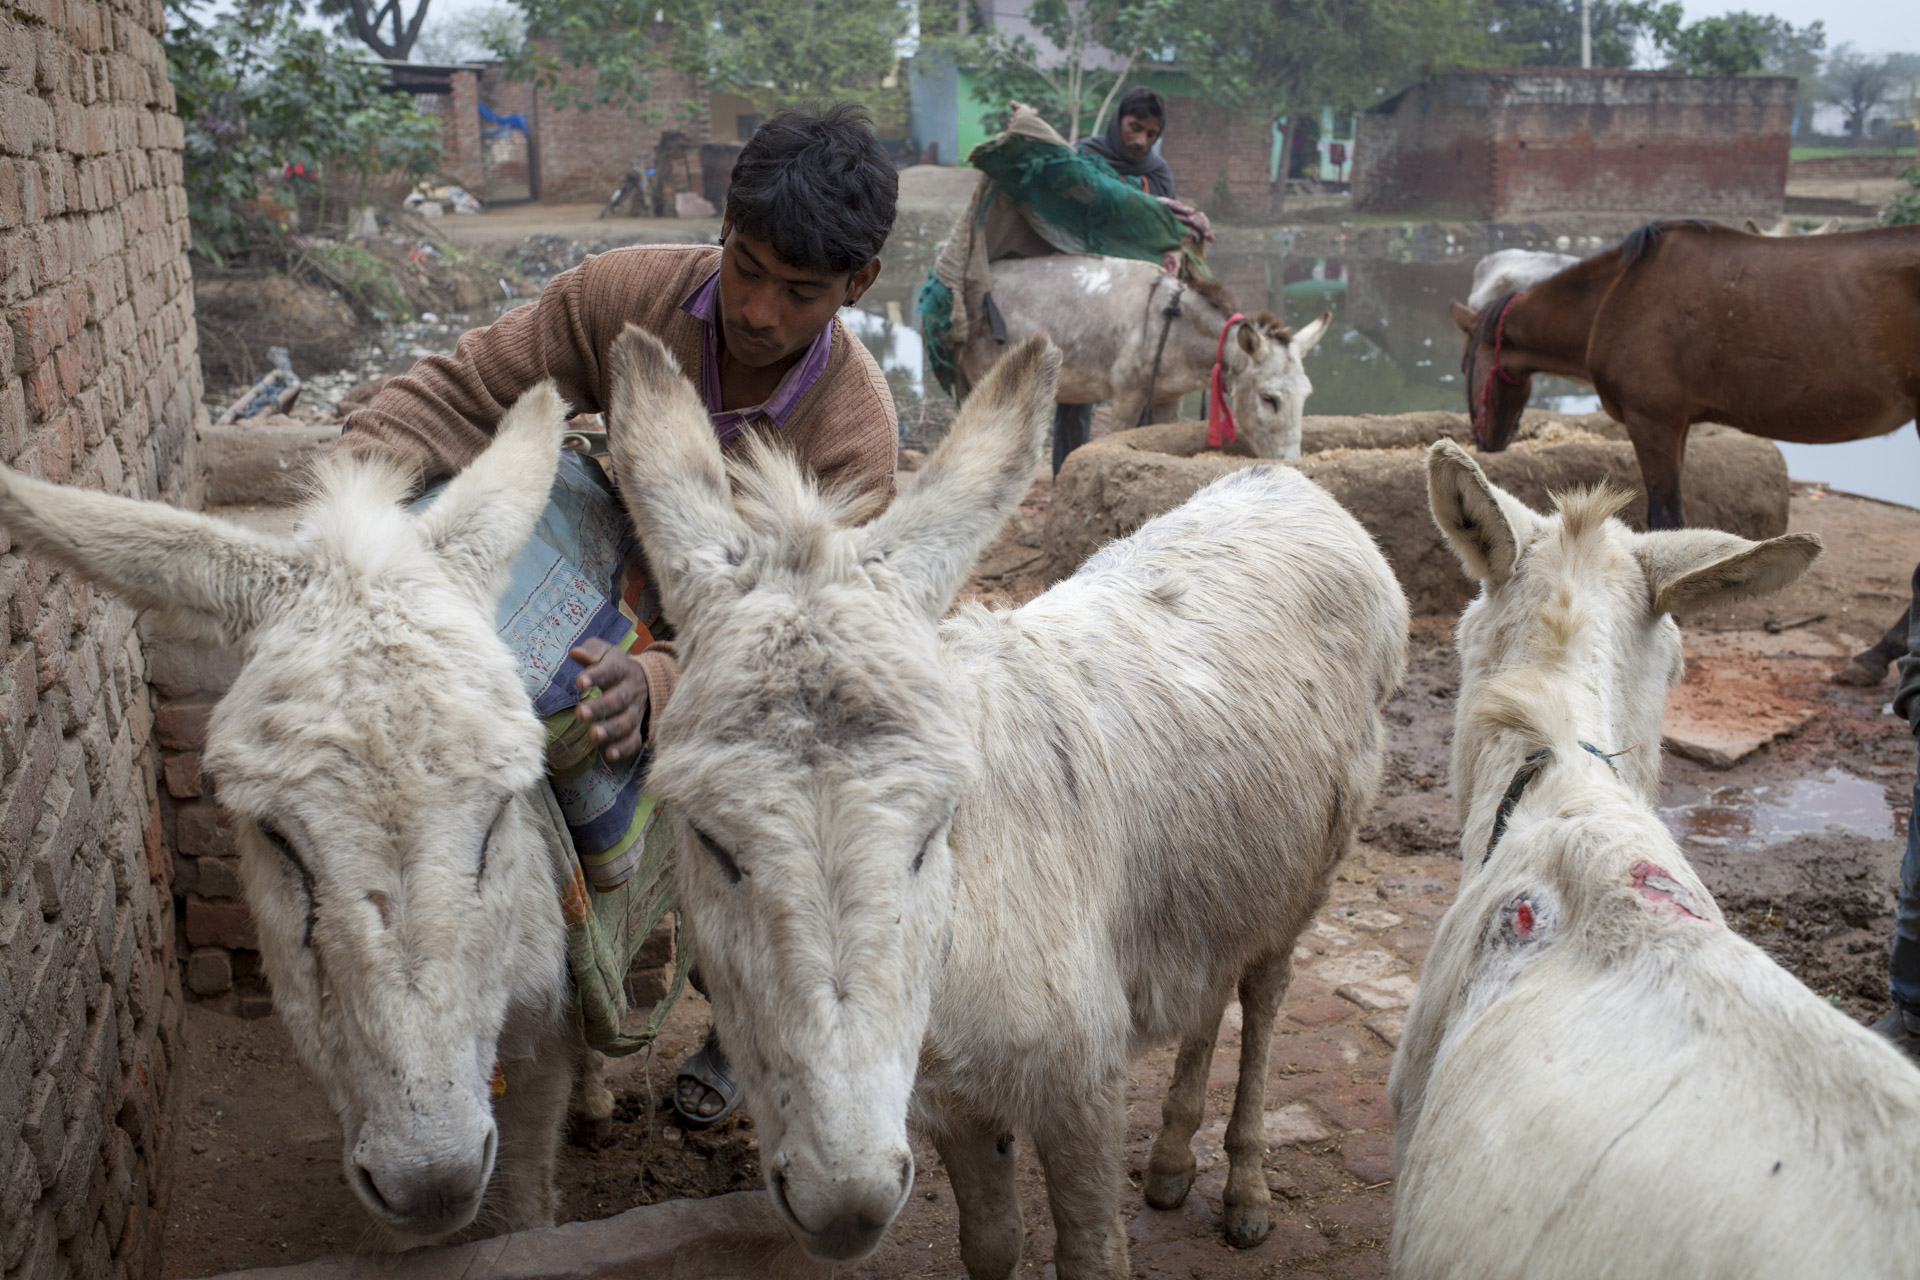 Madhupur Village near Agra, Uttar Pradesh, India. Harish (19) owns five donkeys and works at the VIP brick kiln about ten kilometres from Madhupur village.